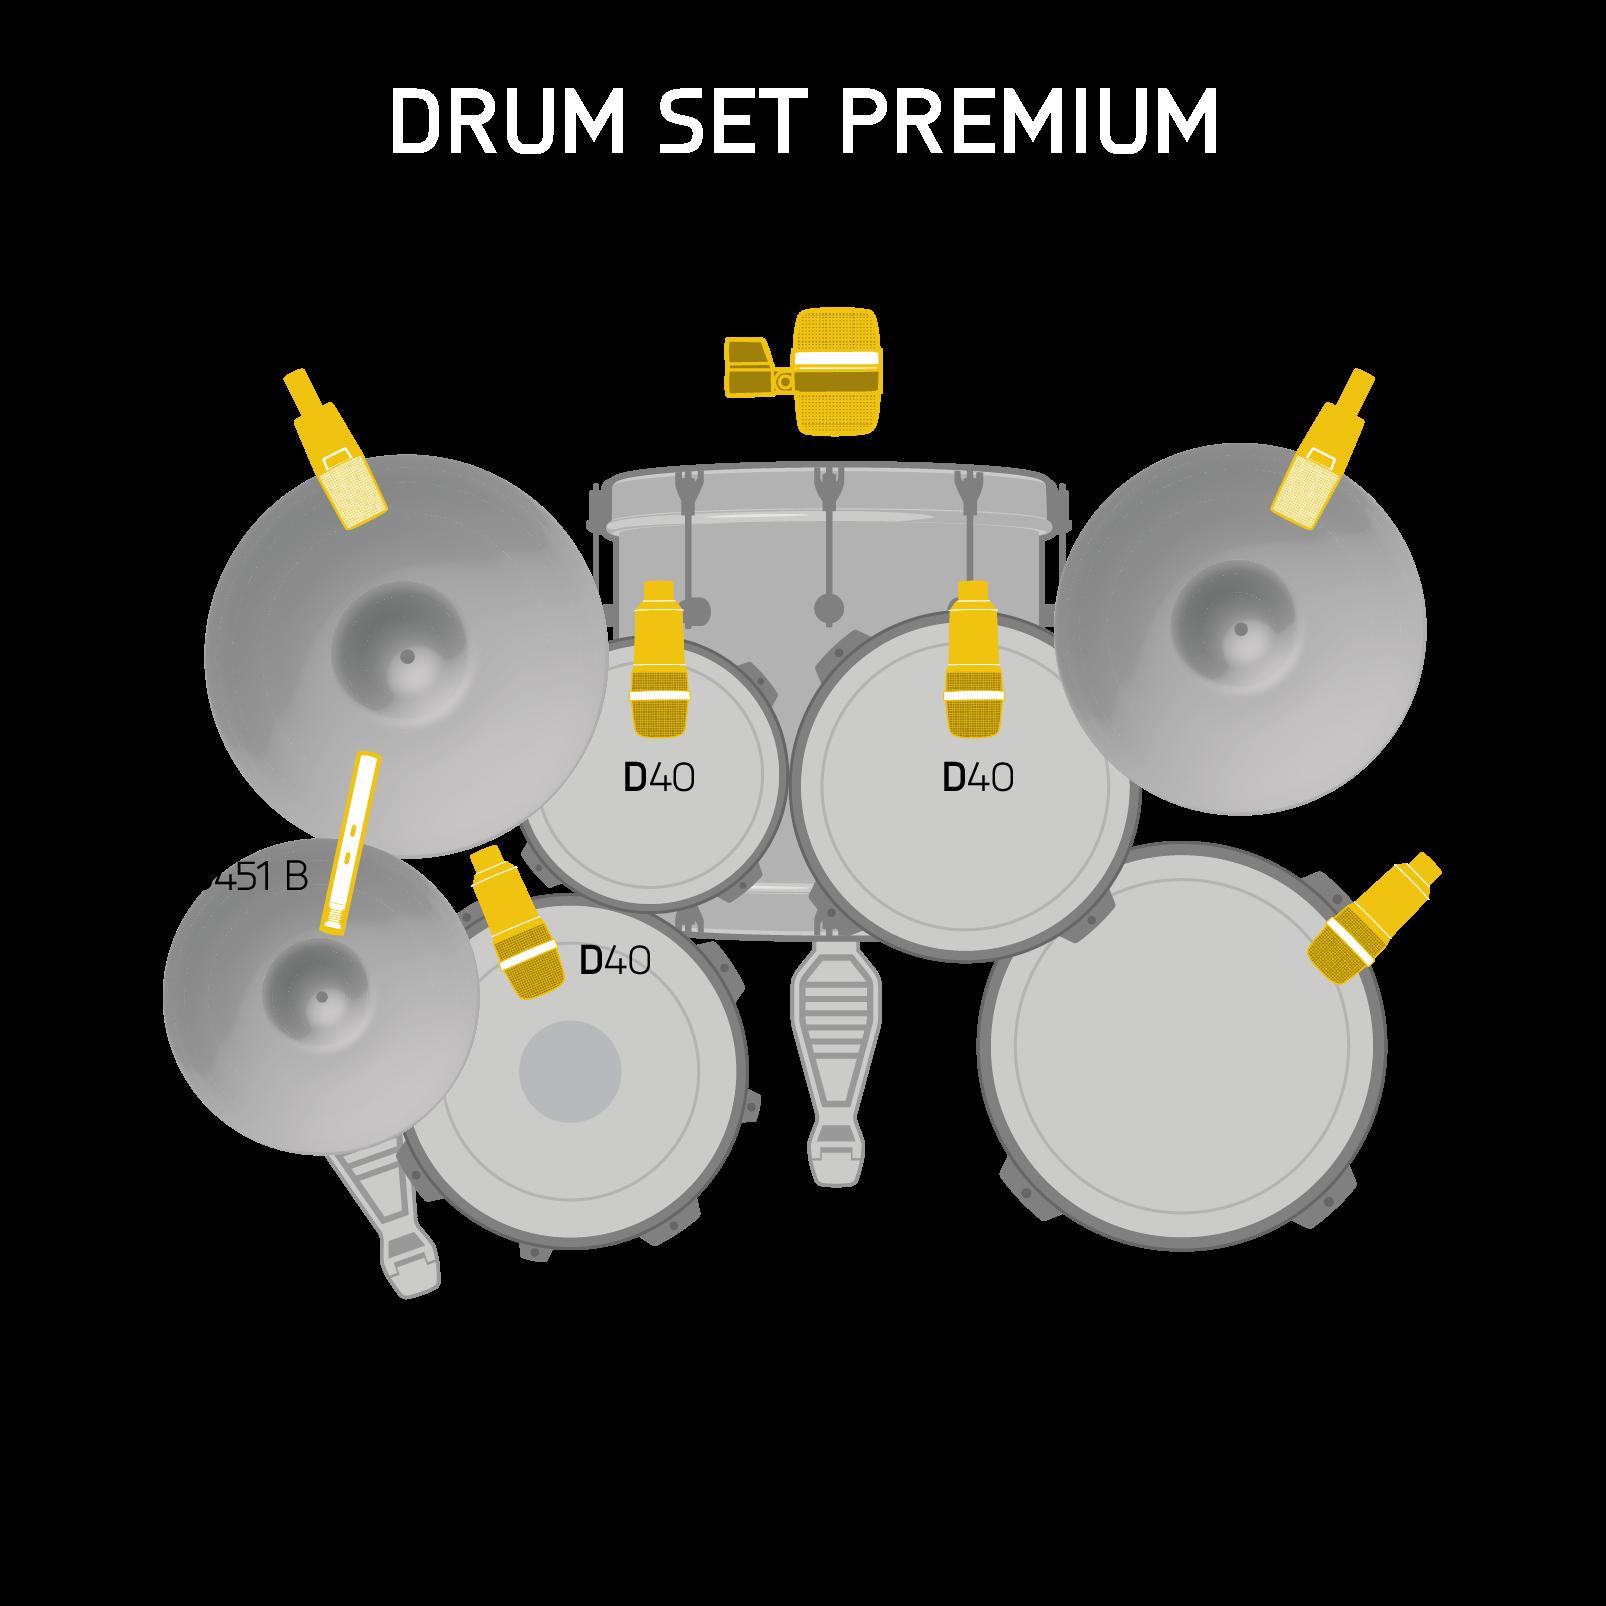 Drum Set Premium - Black - Reference drum microphone Set - Detailshot 1